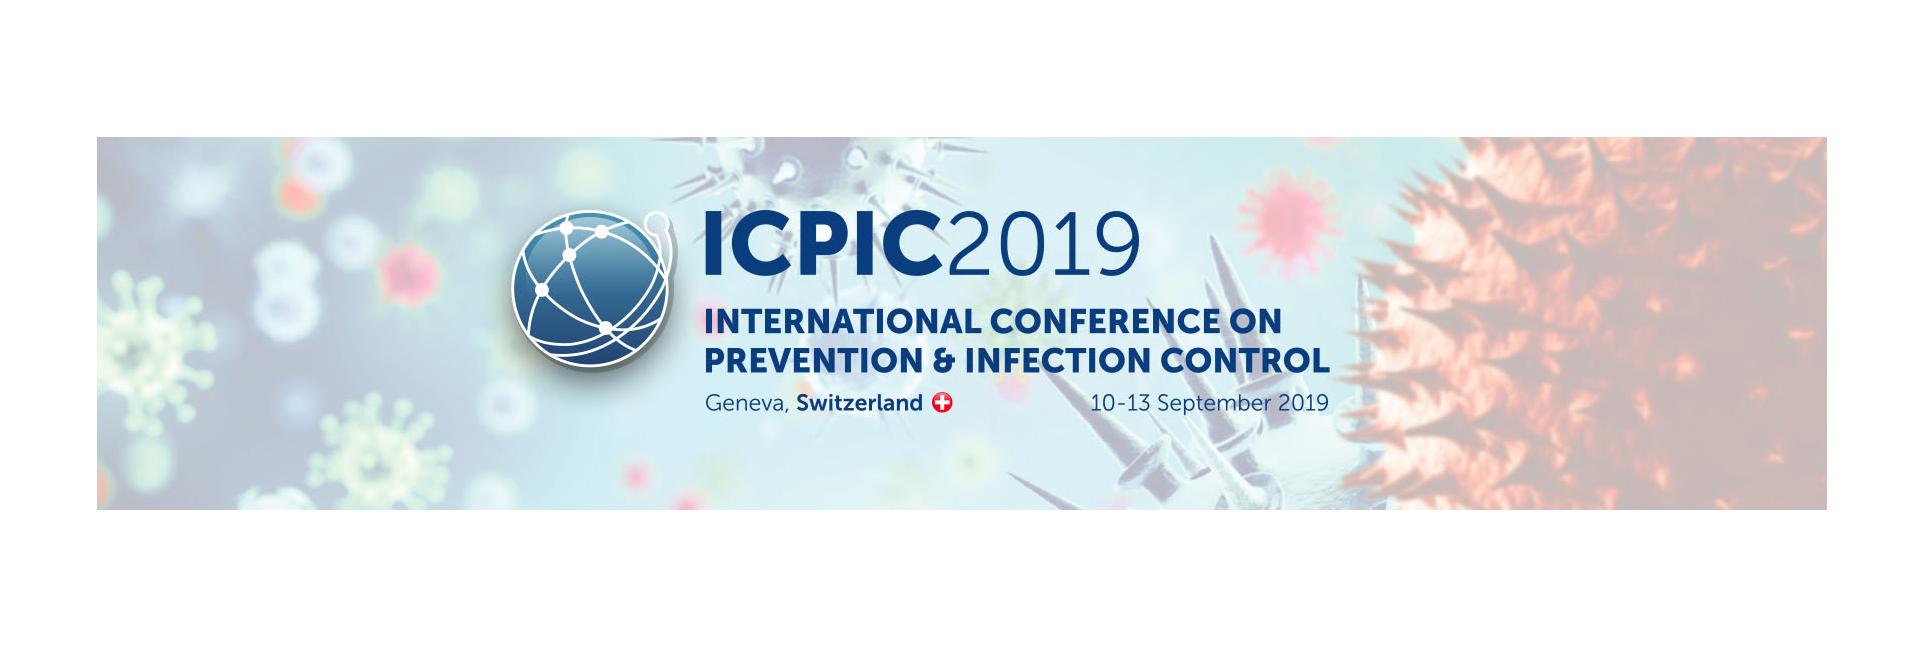 ICPIC 2019